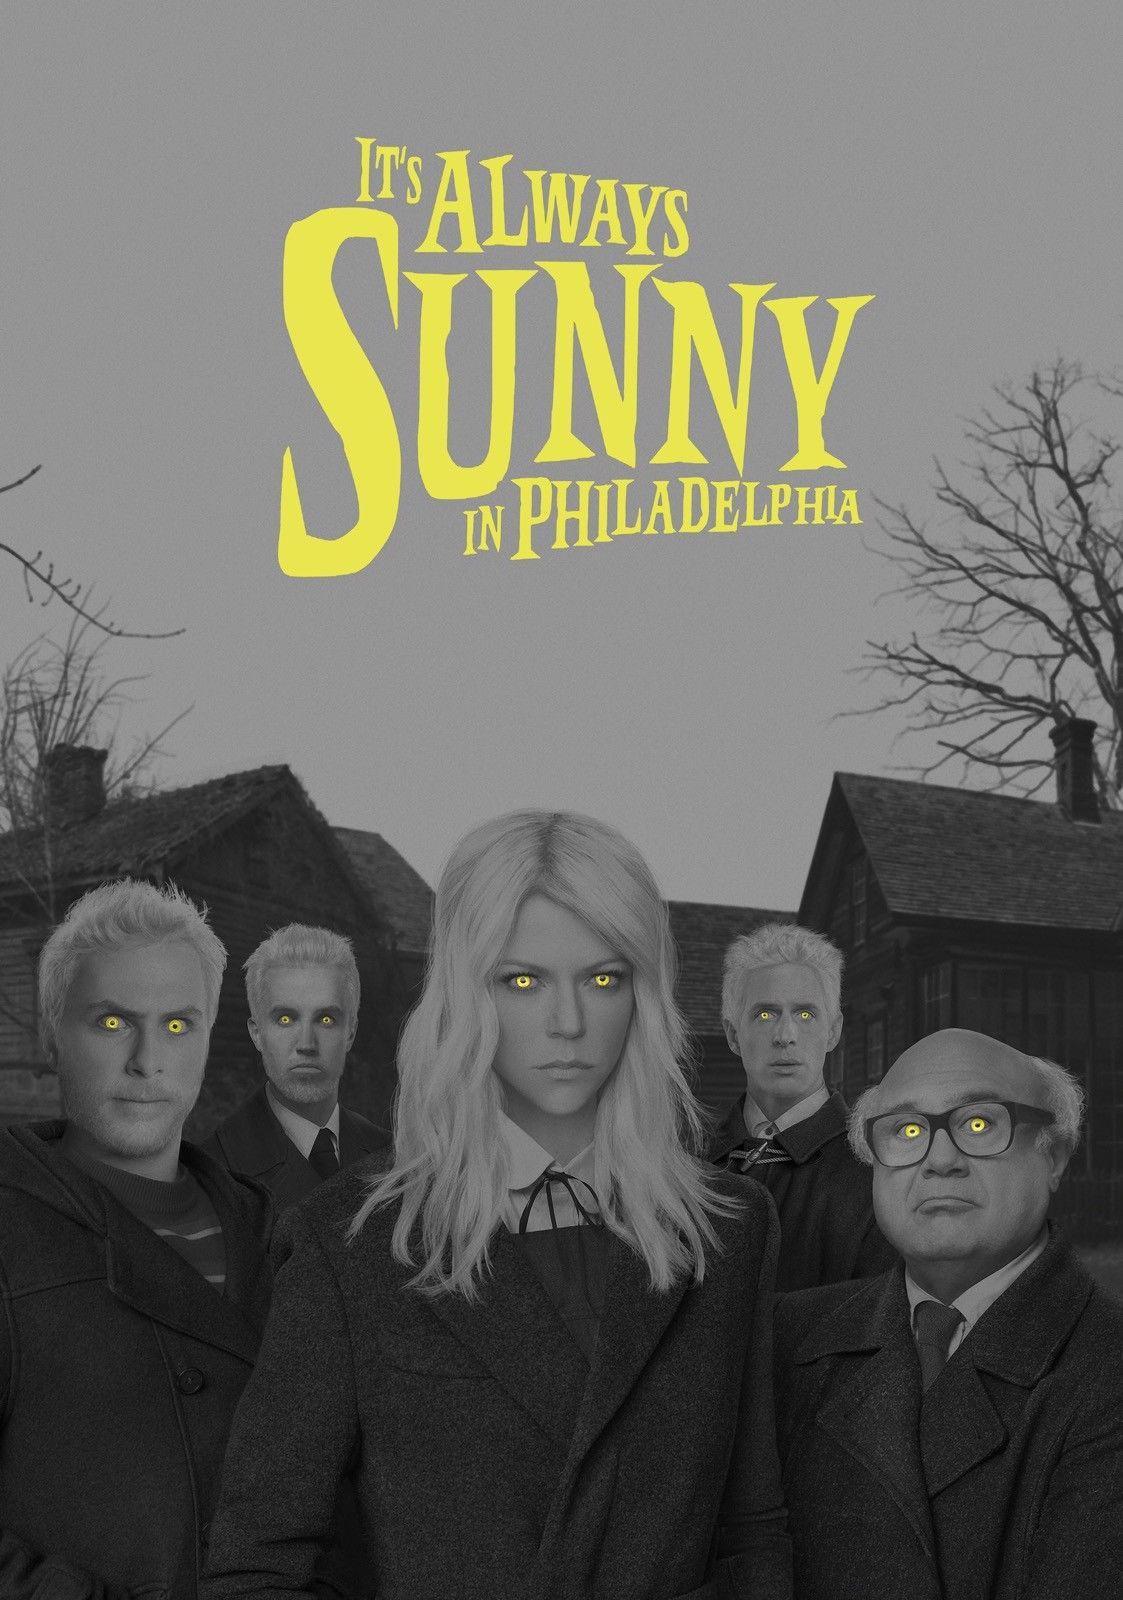 Es ist immer sonnig in Philadelphia Serie TV Foto Stampa Poster Serie Ghisa Art Silk Print Poster 24x36 Zoll (60x90 cm)